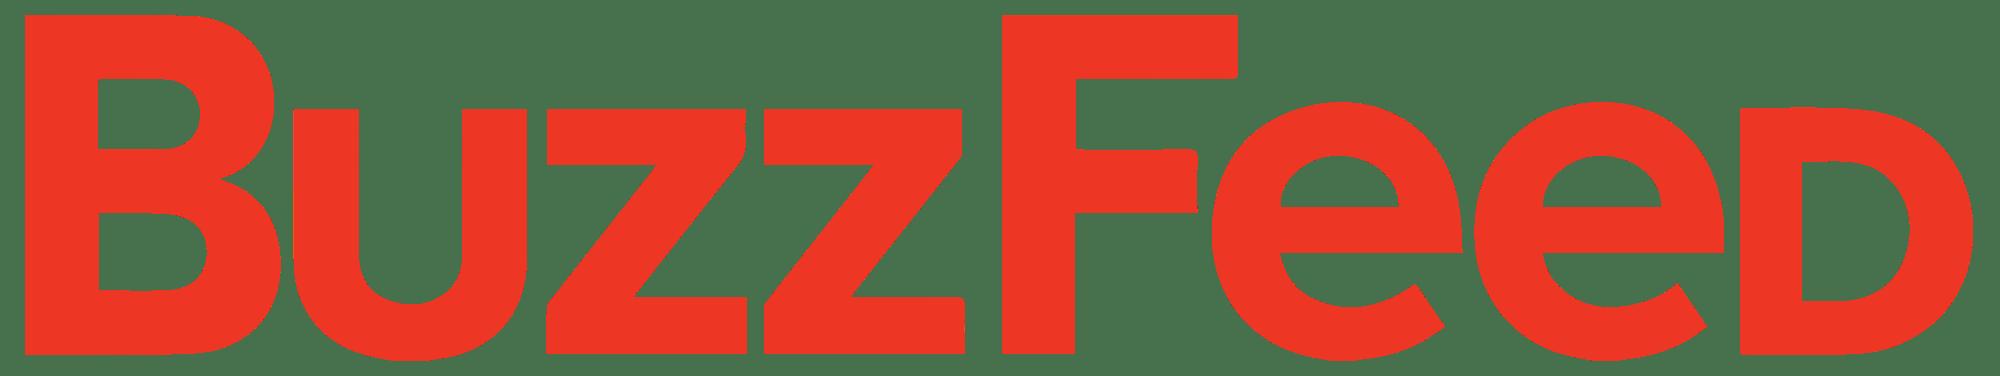 Buzzfeed_logo.png